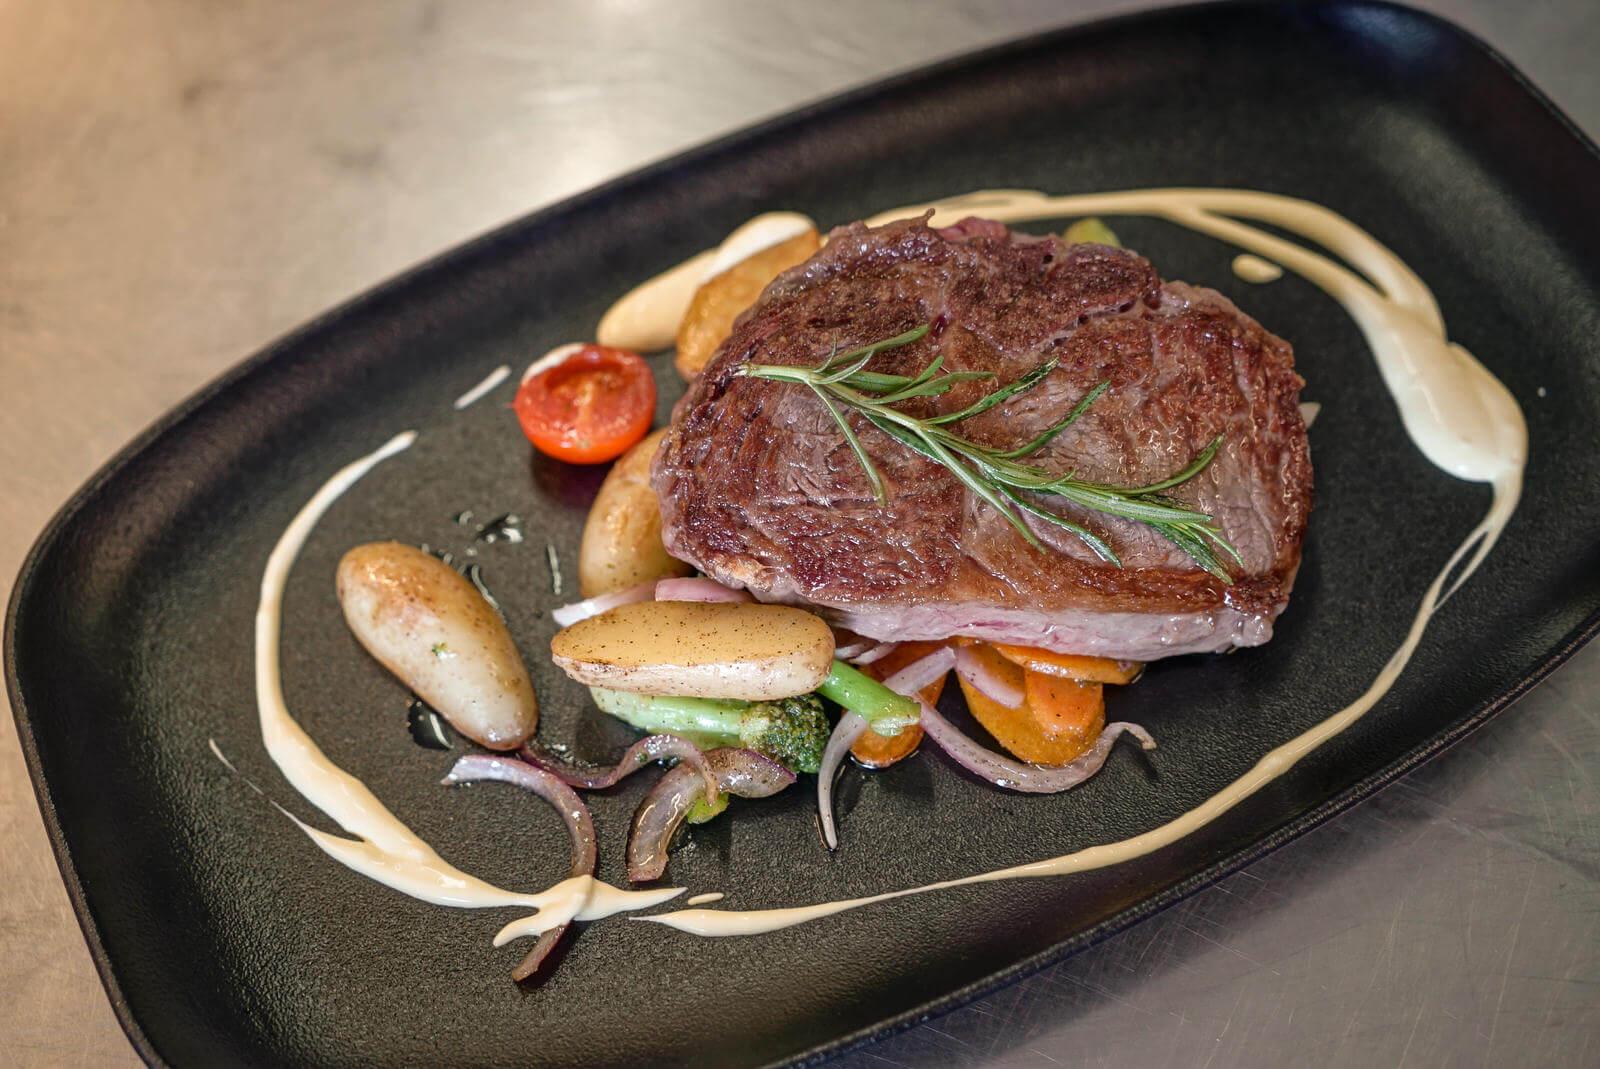 Loft-Potsdam-Location-Speisen-Steak40 Kopie